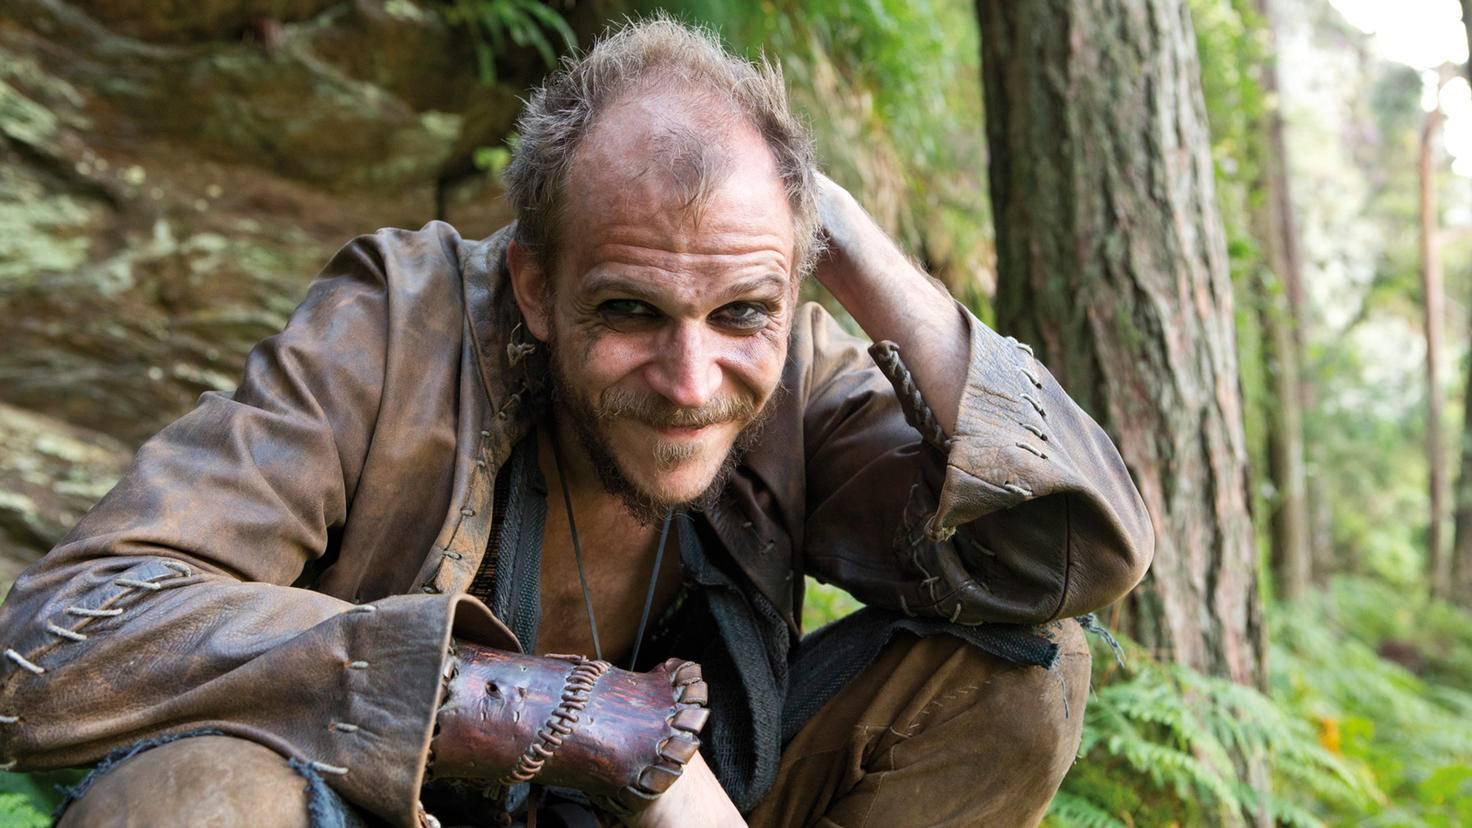 Gustaf Skarsgård als Floki in Staffel 1 von Vikings